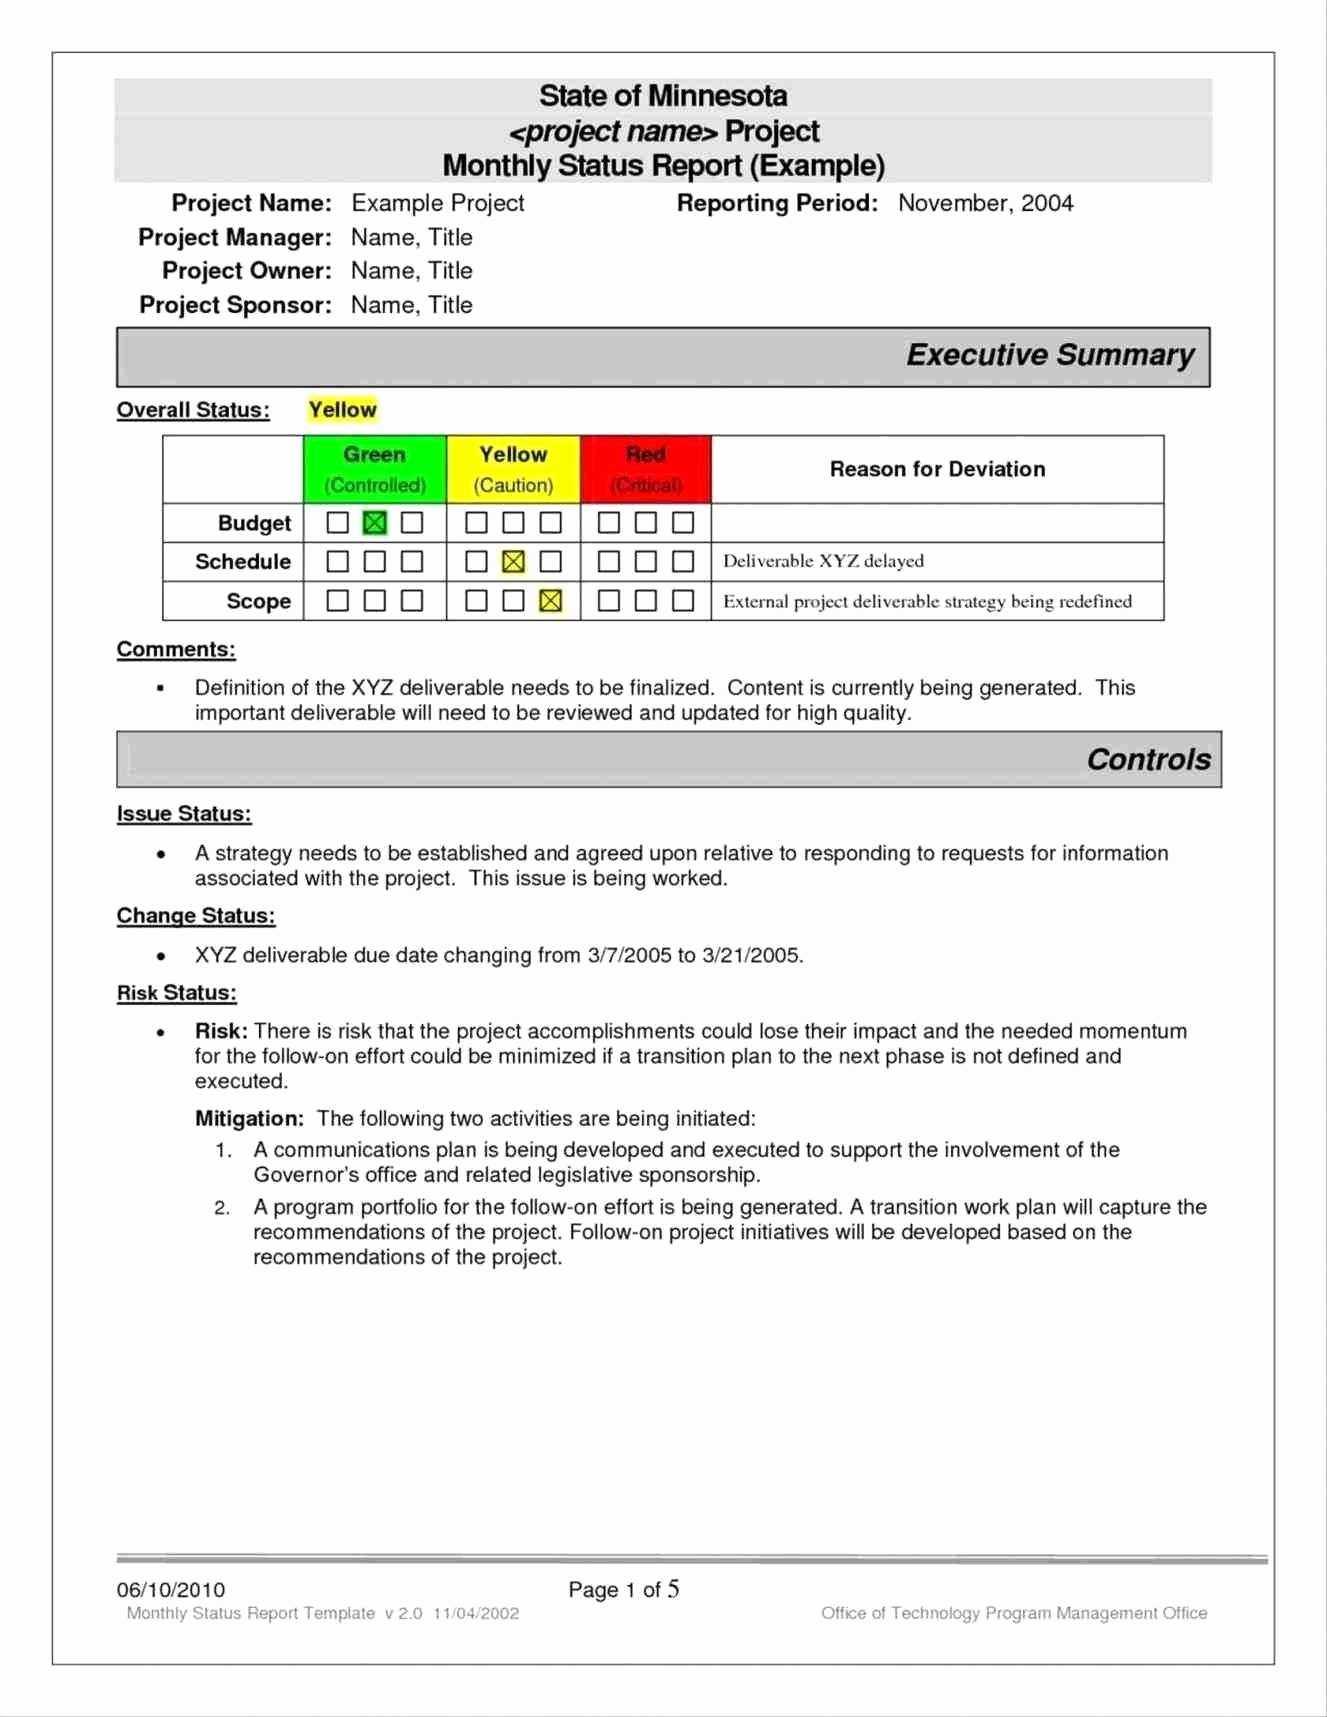 Monthly Status Report Template Word - Karati.ald2014 Within Project Status Report Template Word 2010